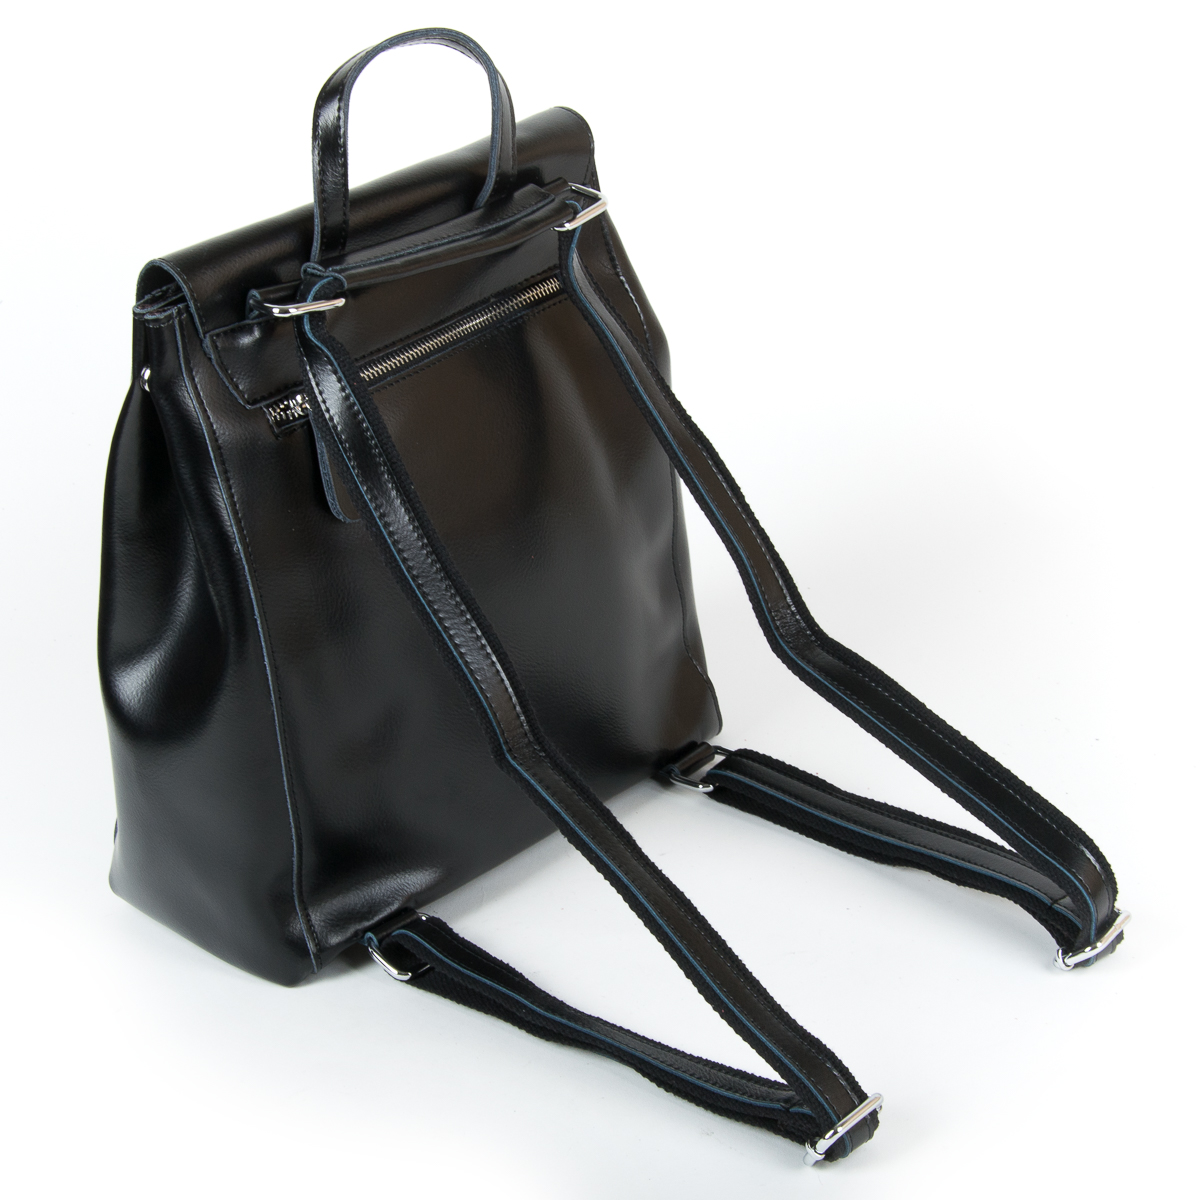 Сумка Женская Рюкзак кожа ALEX RAI 9-01 360 black - фото 4